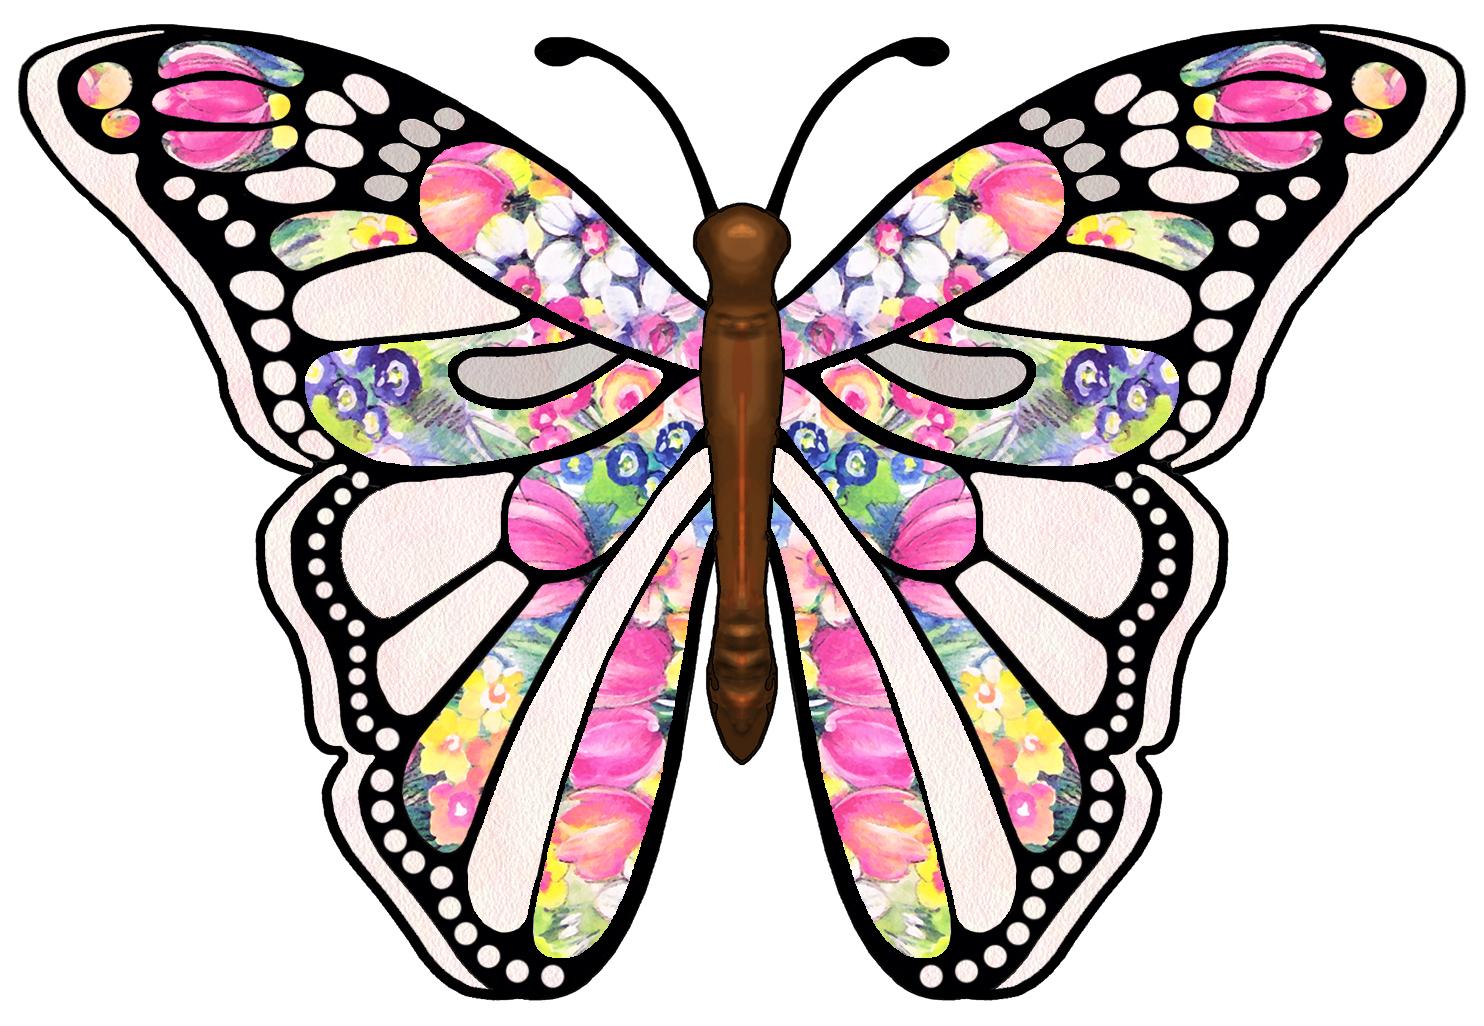 Butterfly Free Clip Art 1484x1026 Wallpaper Teahub Io